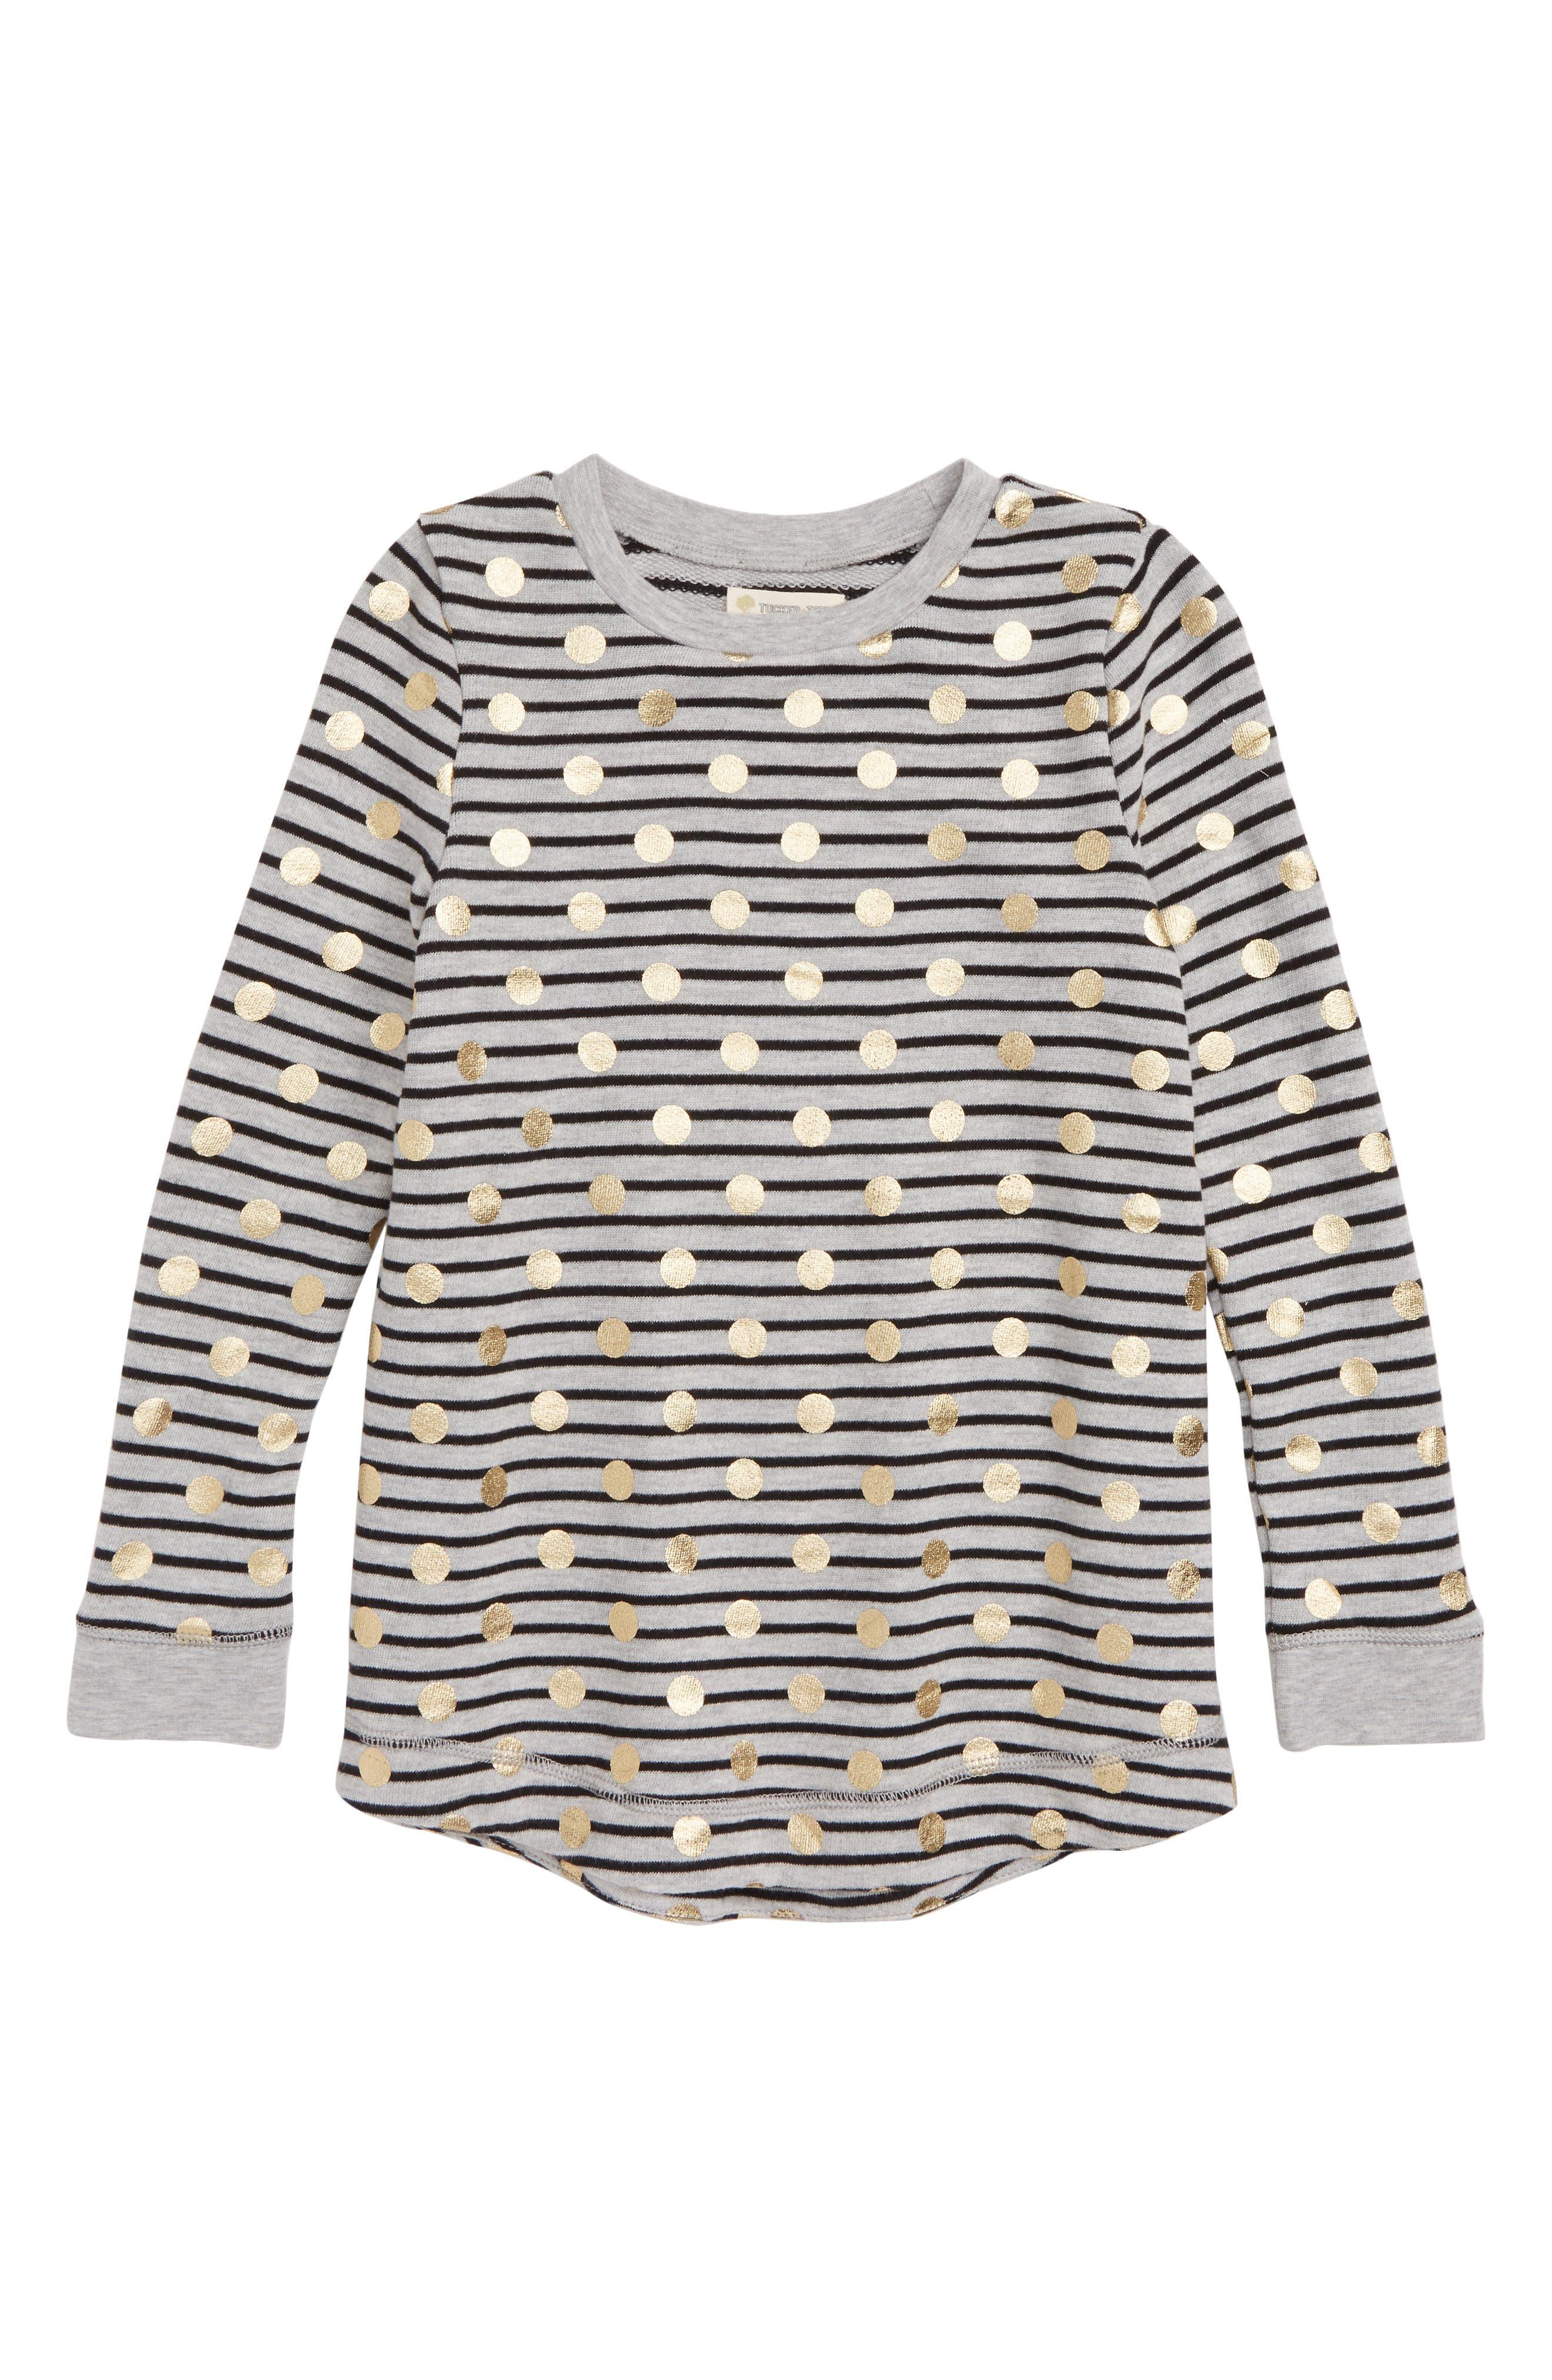 Stripe Print Tunic,                         Main,                         color, GREY ASH HEATHER DOT